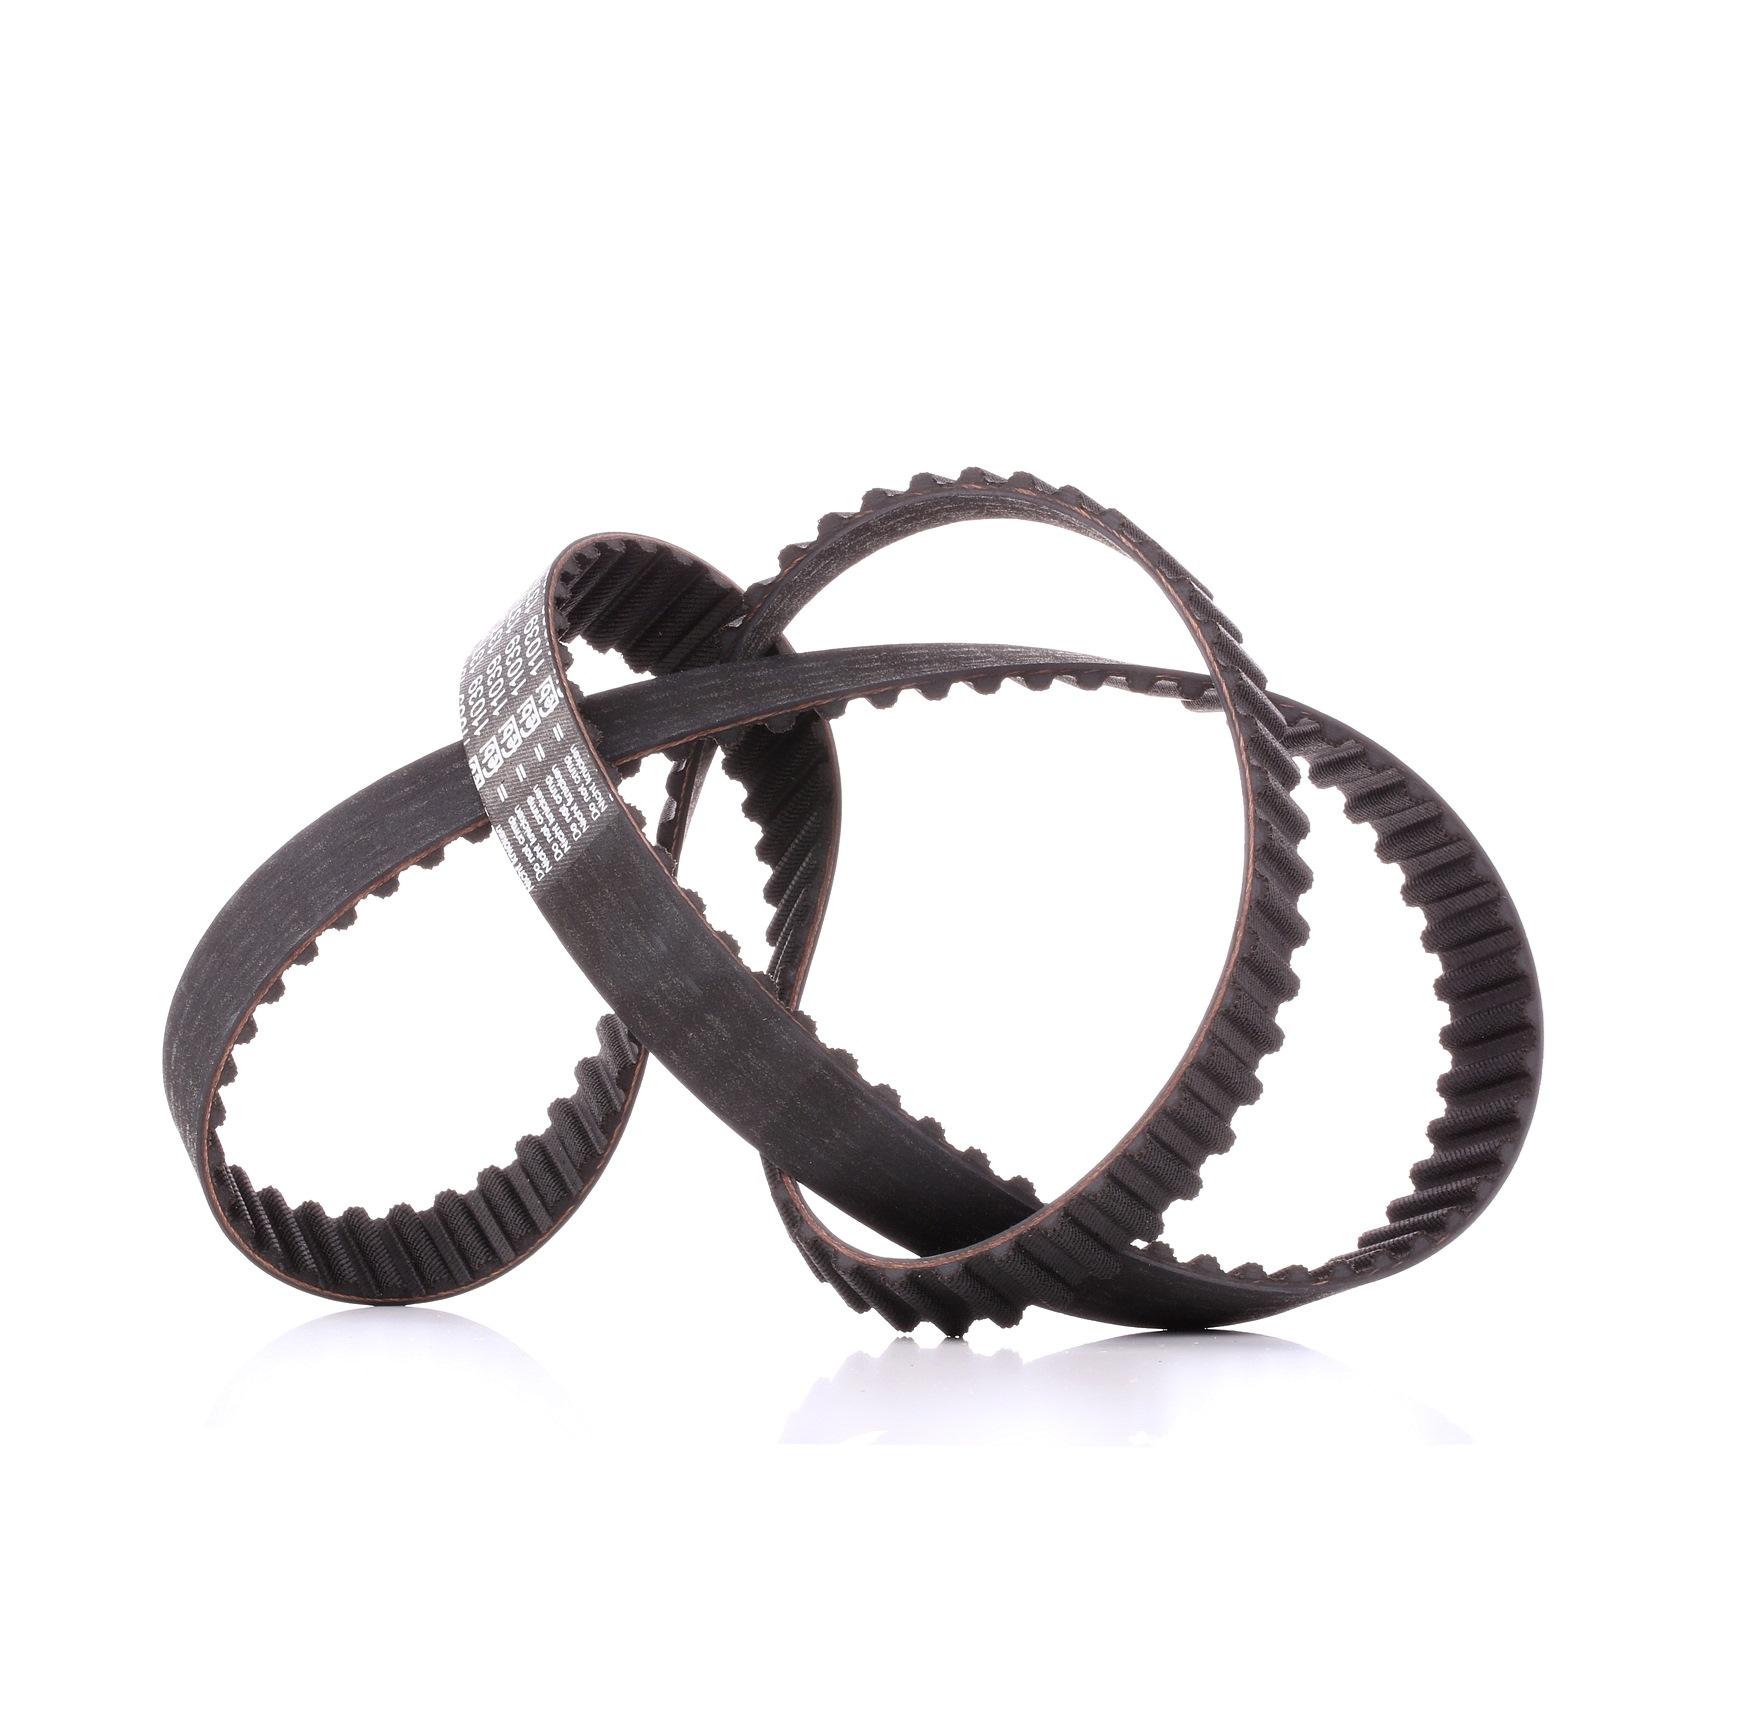 Volkswagen GOL 2012 Belts, chains, rollers FEBI BILSTEIN 11039: Teeth Quant.: 137